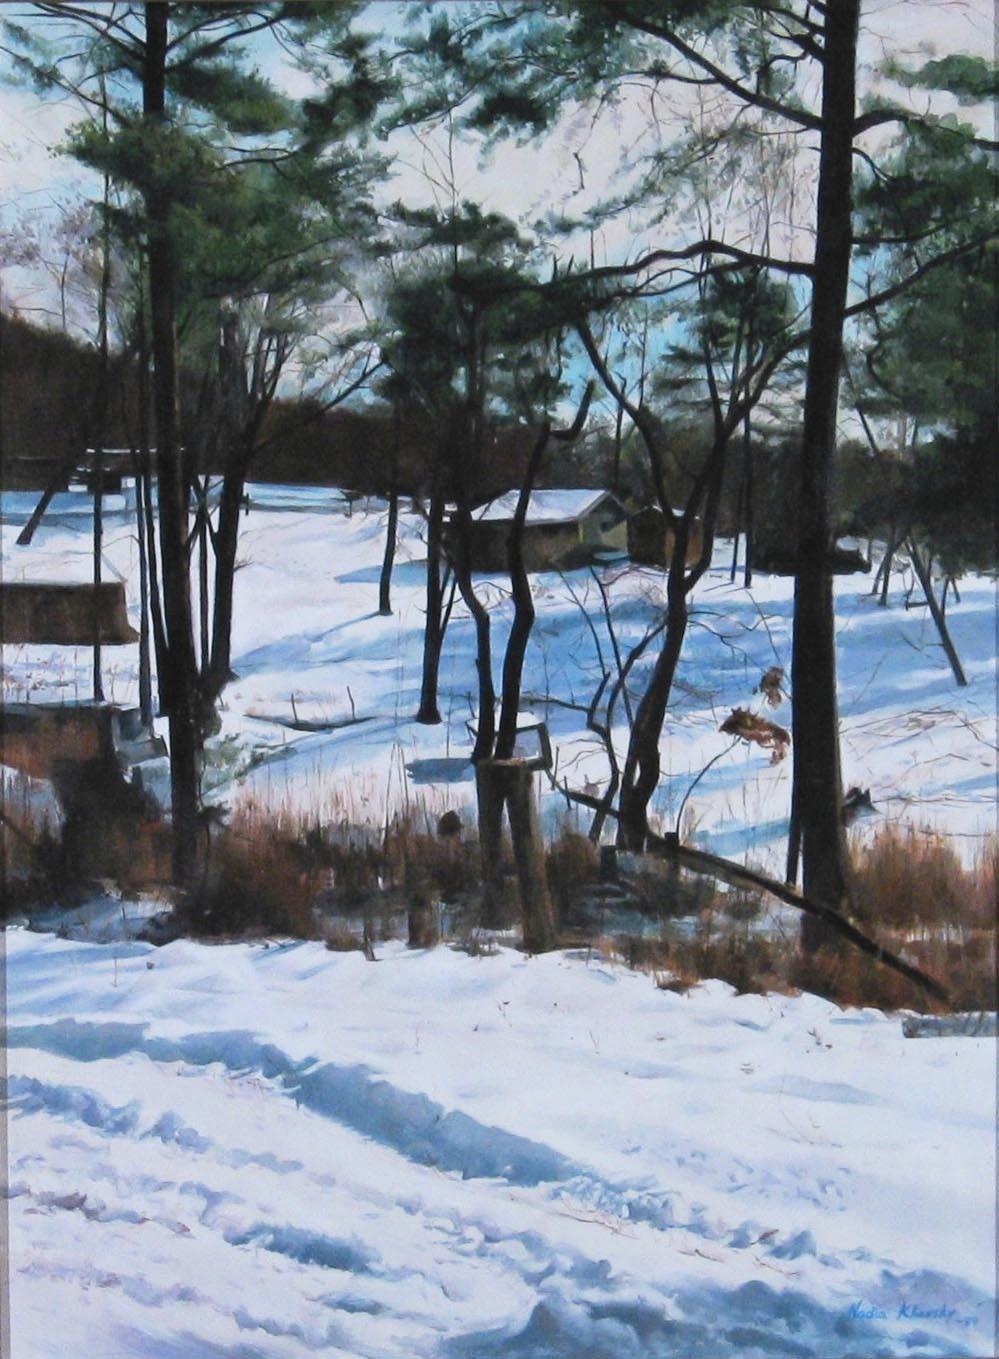 """Winter in Vermont""   Oil on canvas 40"" X 30""   Nadia Klionsky"